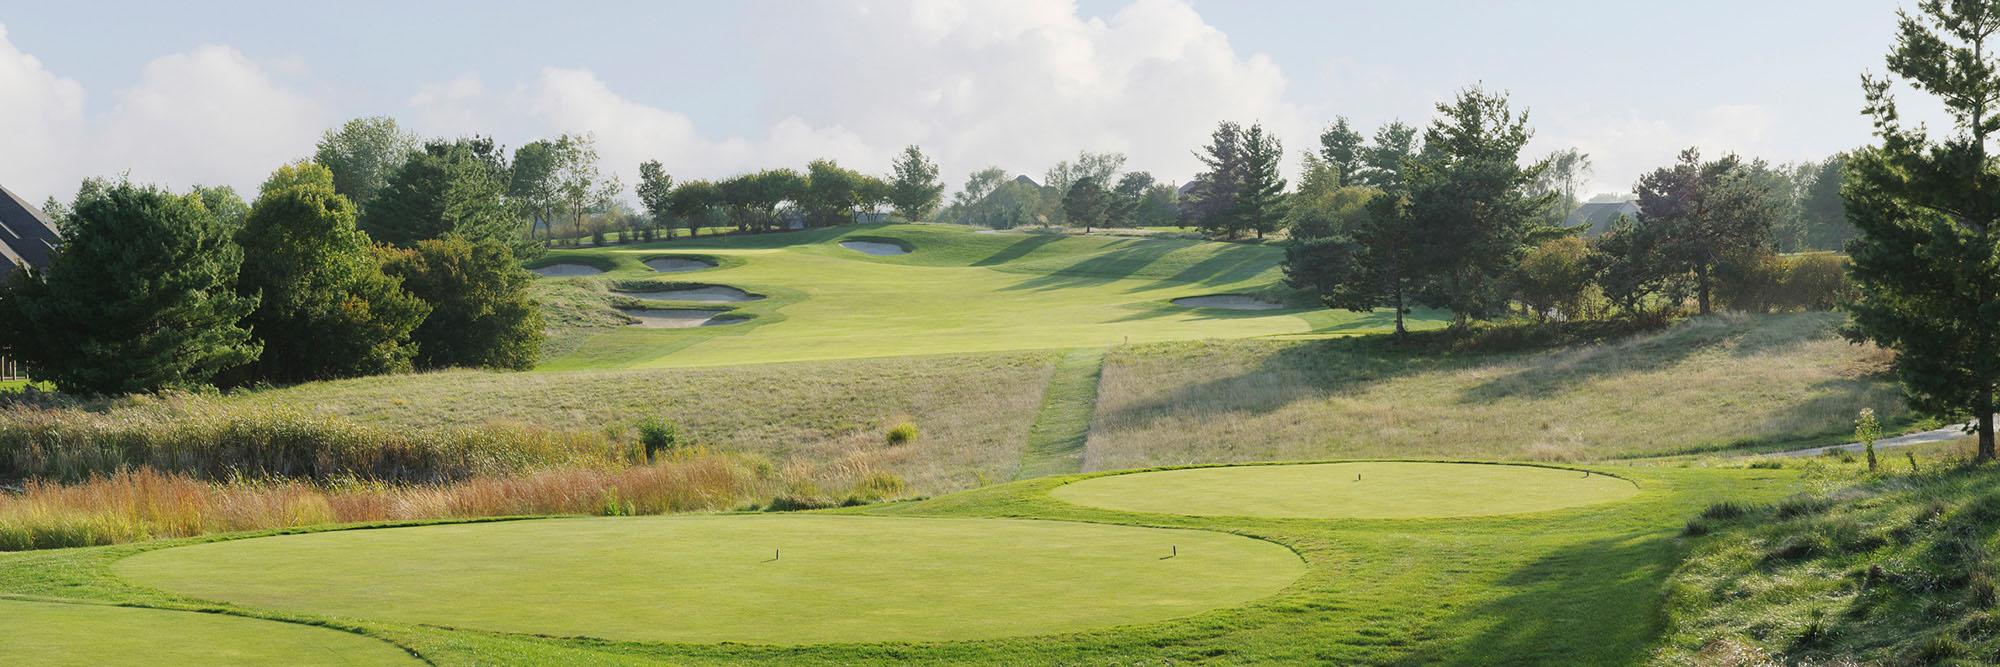 Golf Course Image - Glen Oaks No. 8